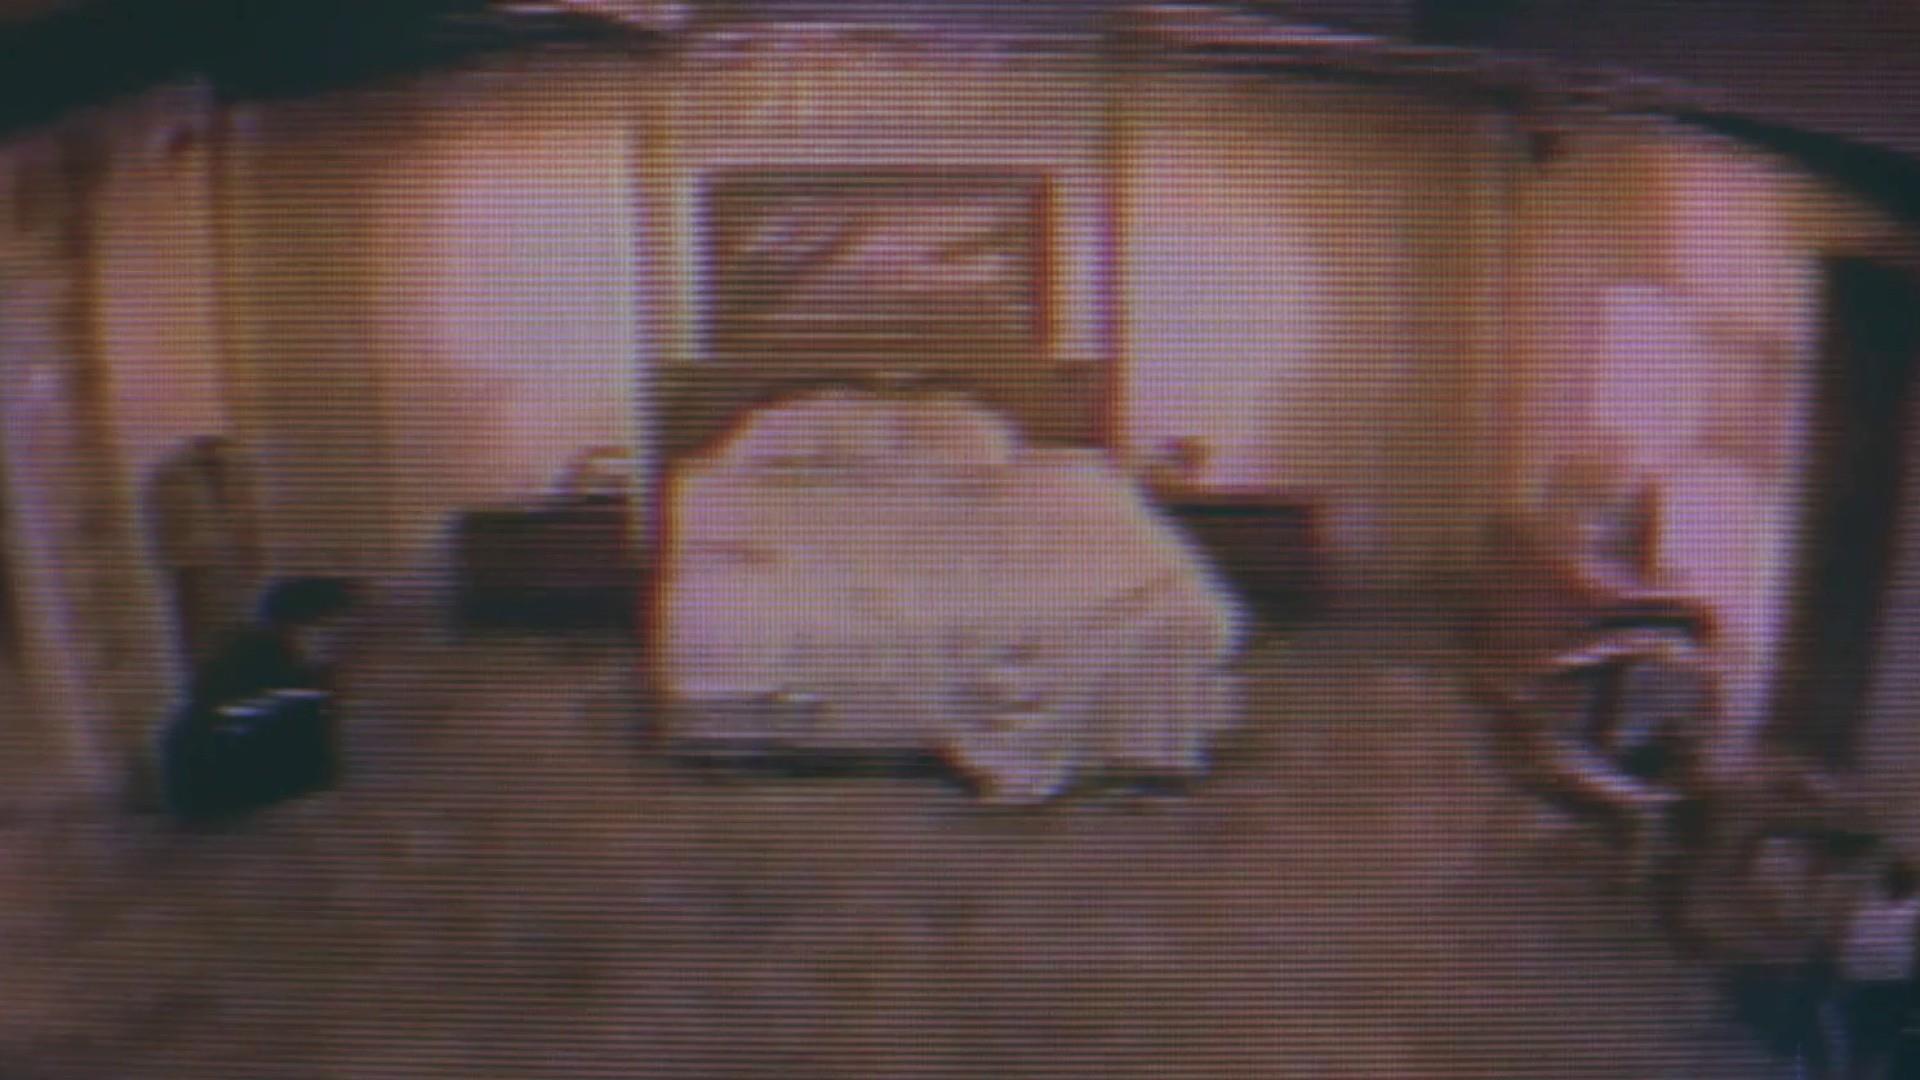 High school students find hidden cameras in Minnesota hotel rooms during school trip